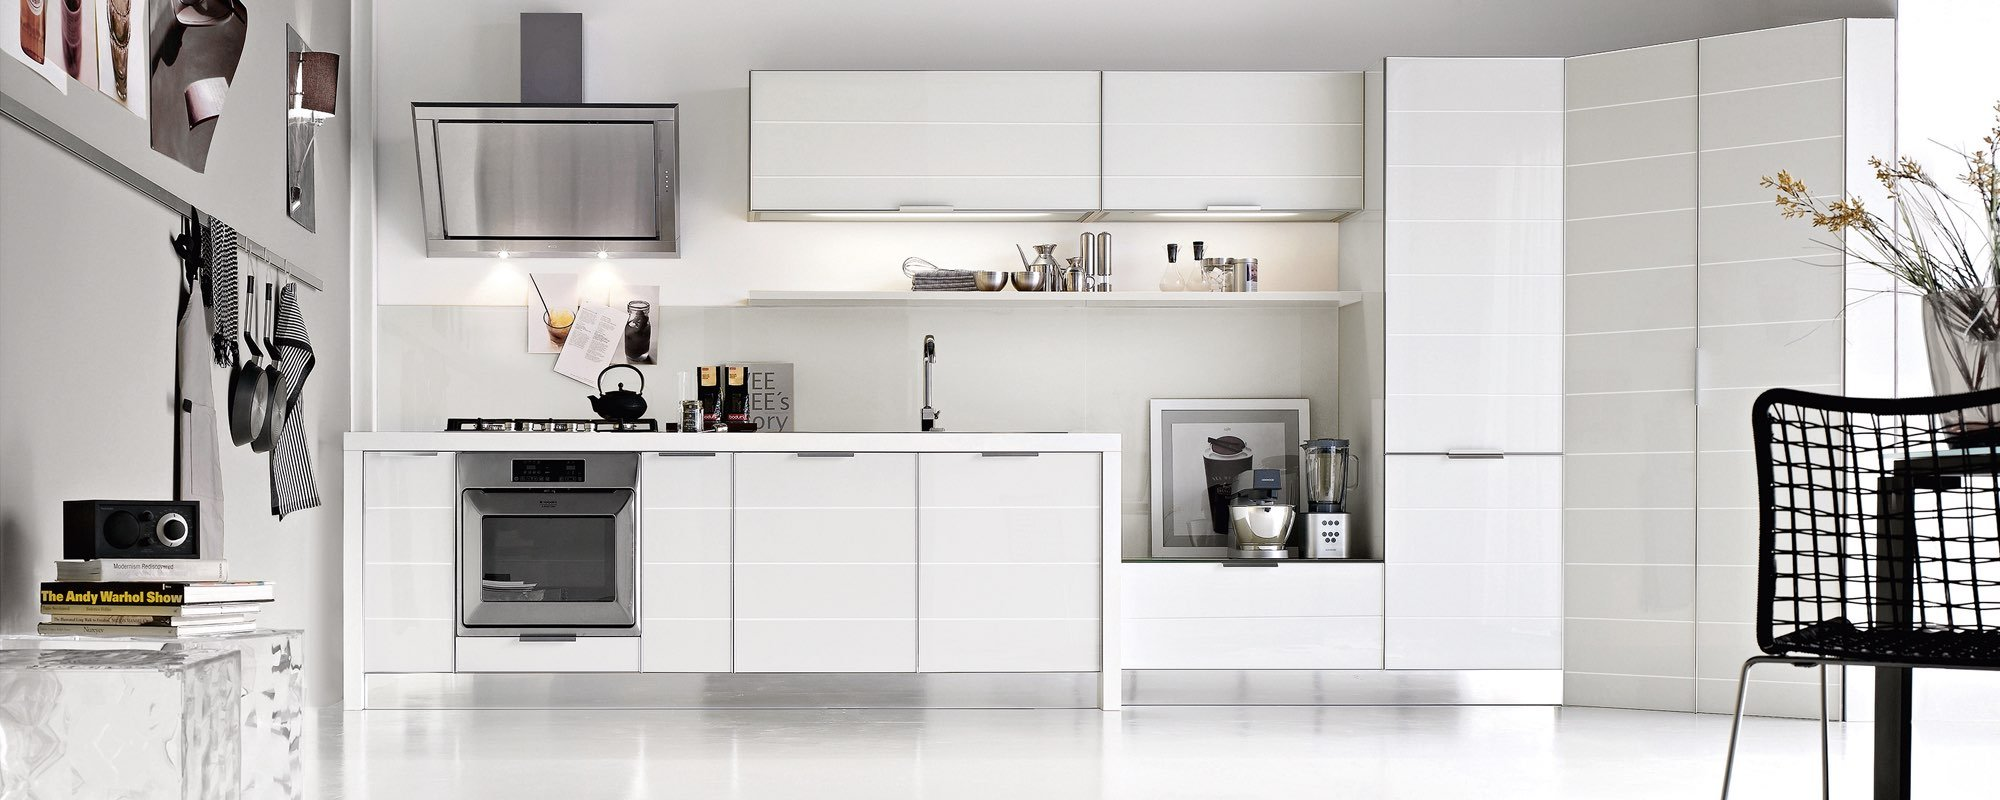 cucina moderna bianca con arredamento -Brilliant